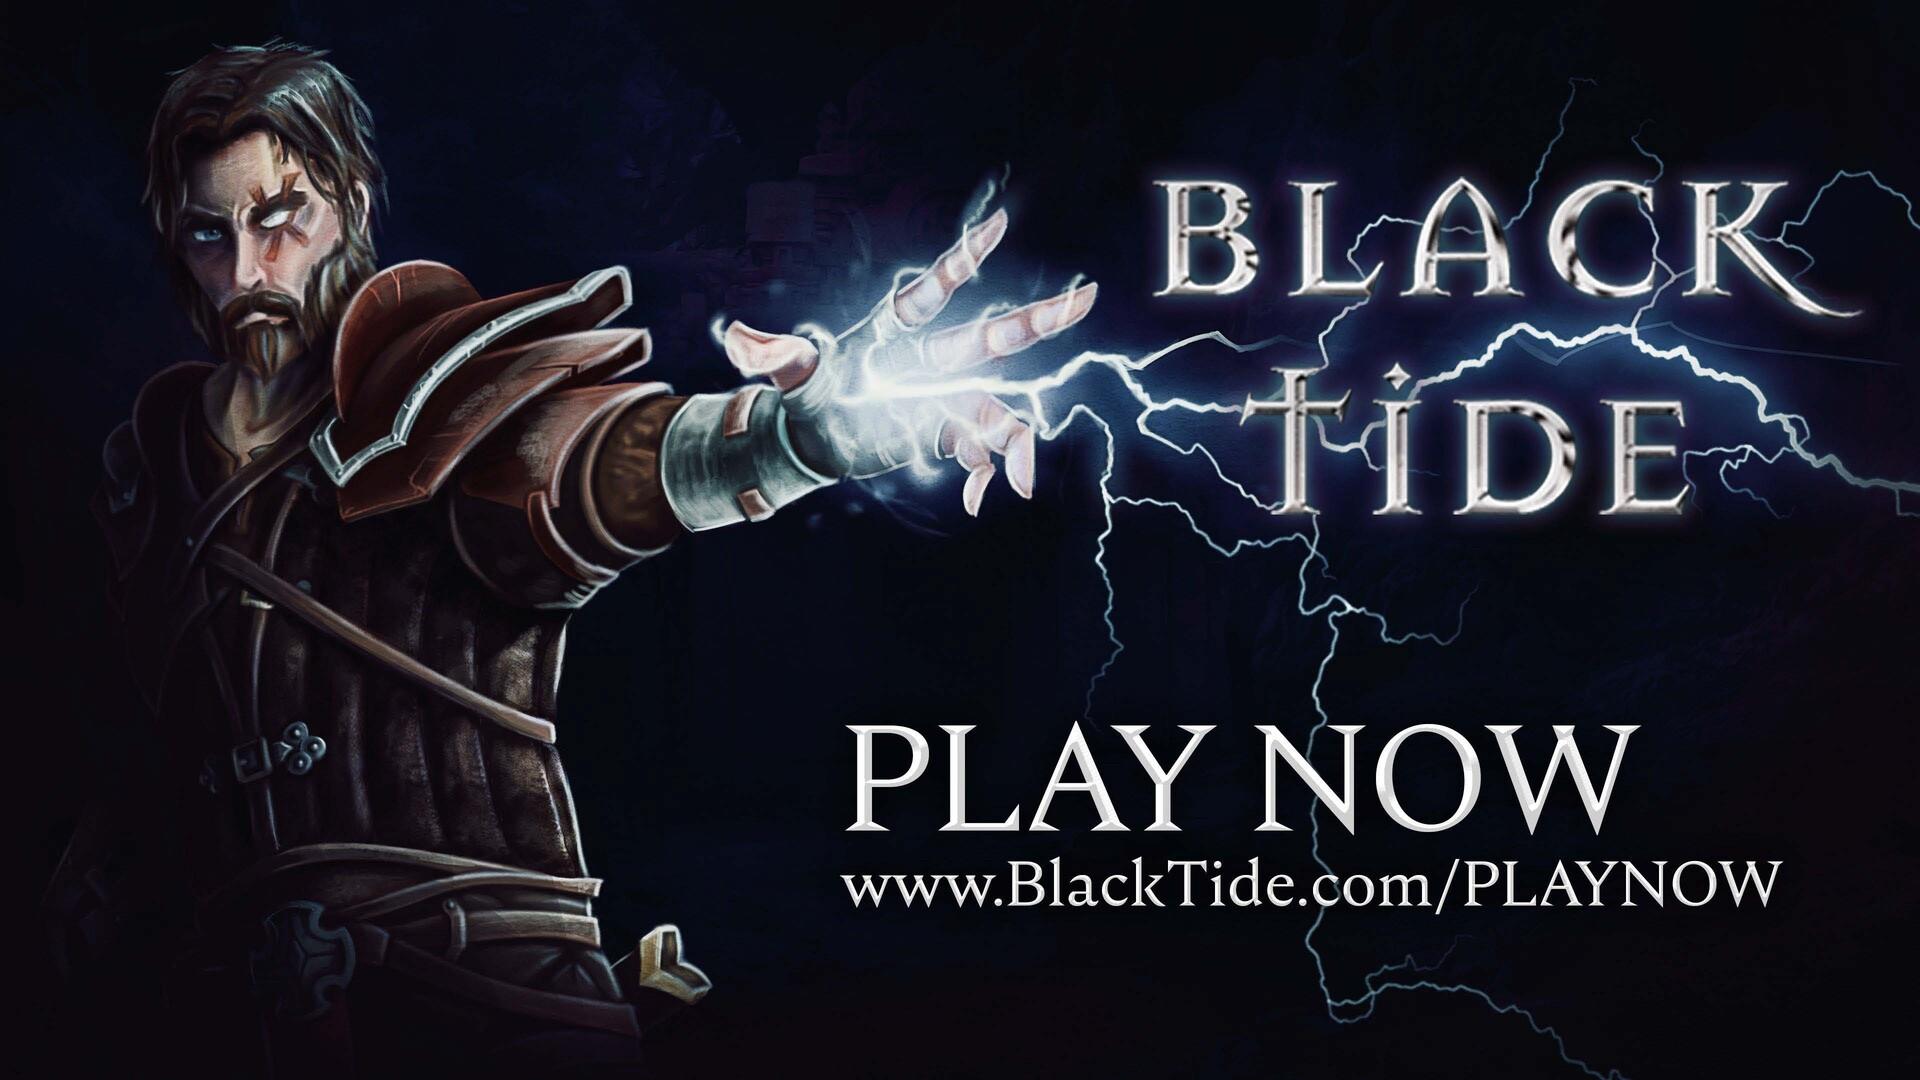 Black Tide - Full Project